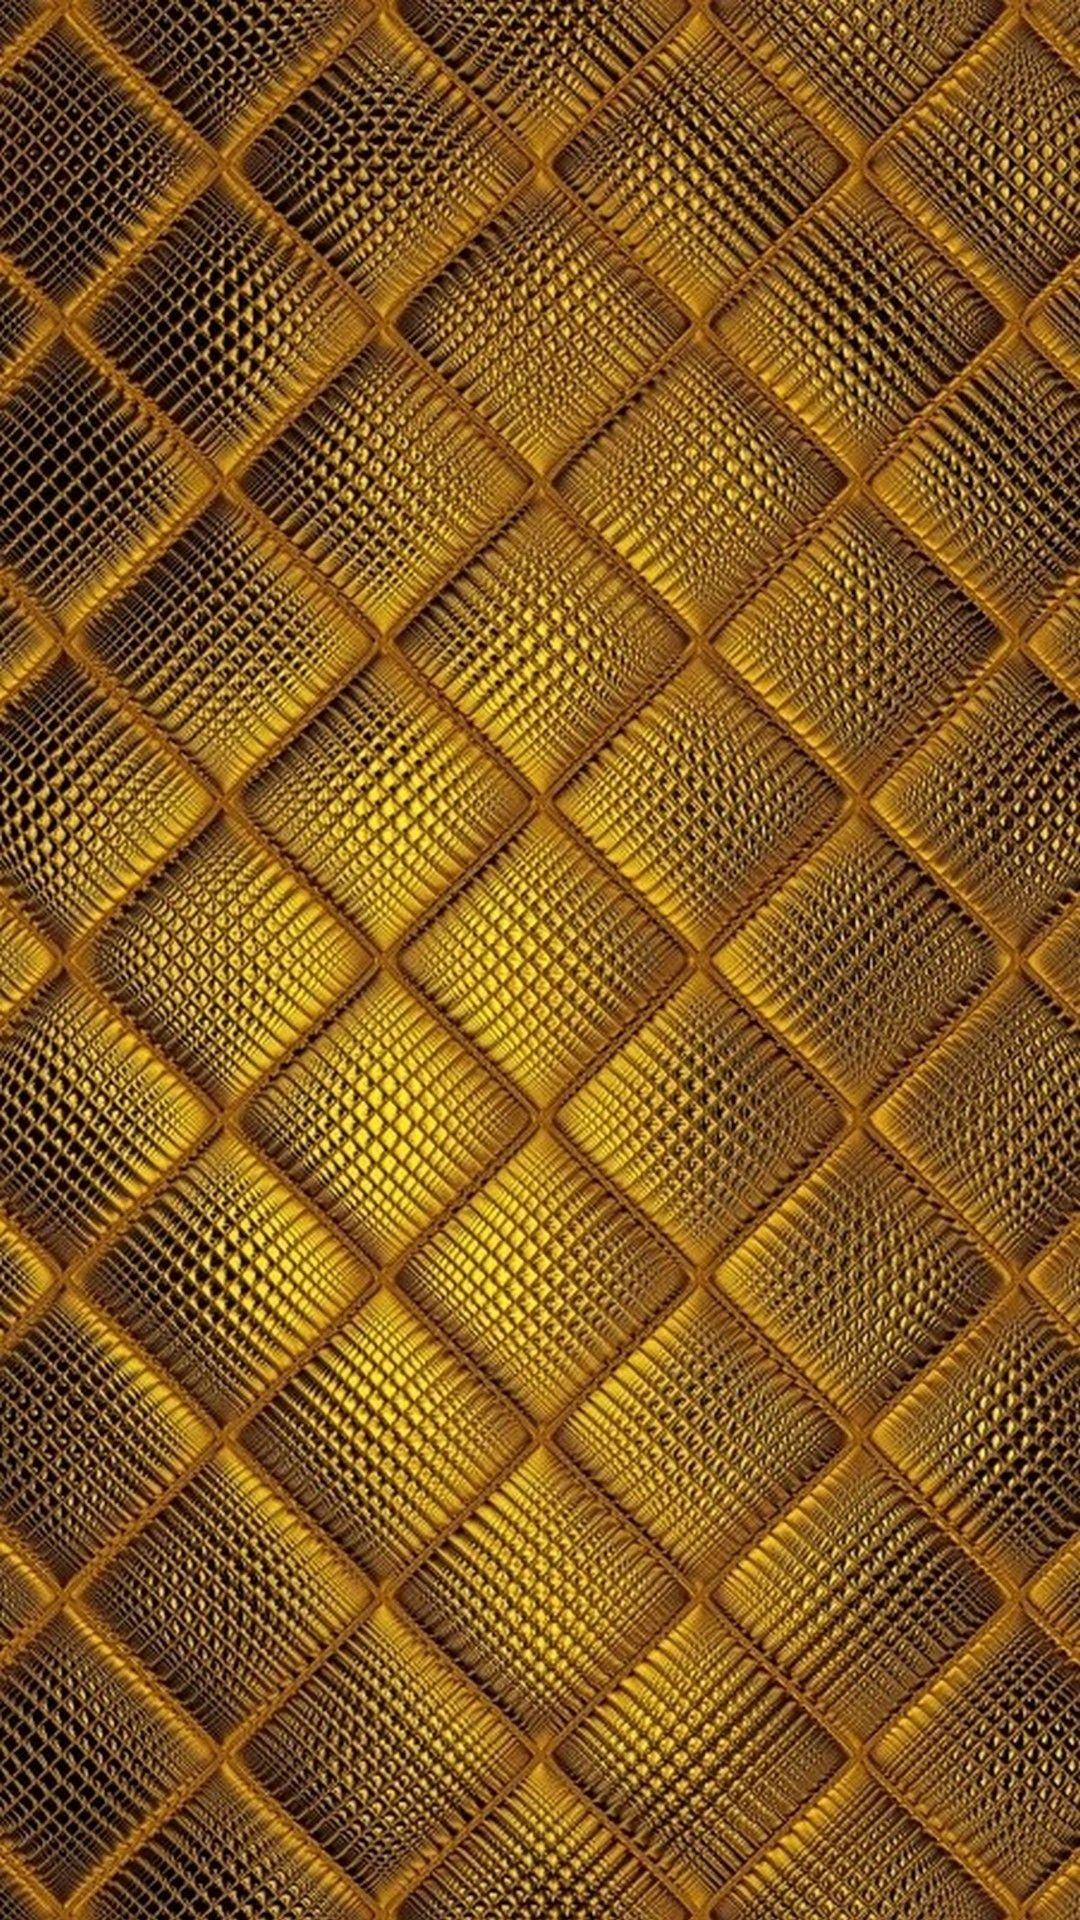 Wallpaper Gold Pattern iPhone | Iphone | Cellphone wallpaper, Gold wallpaper, Iphone